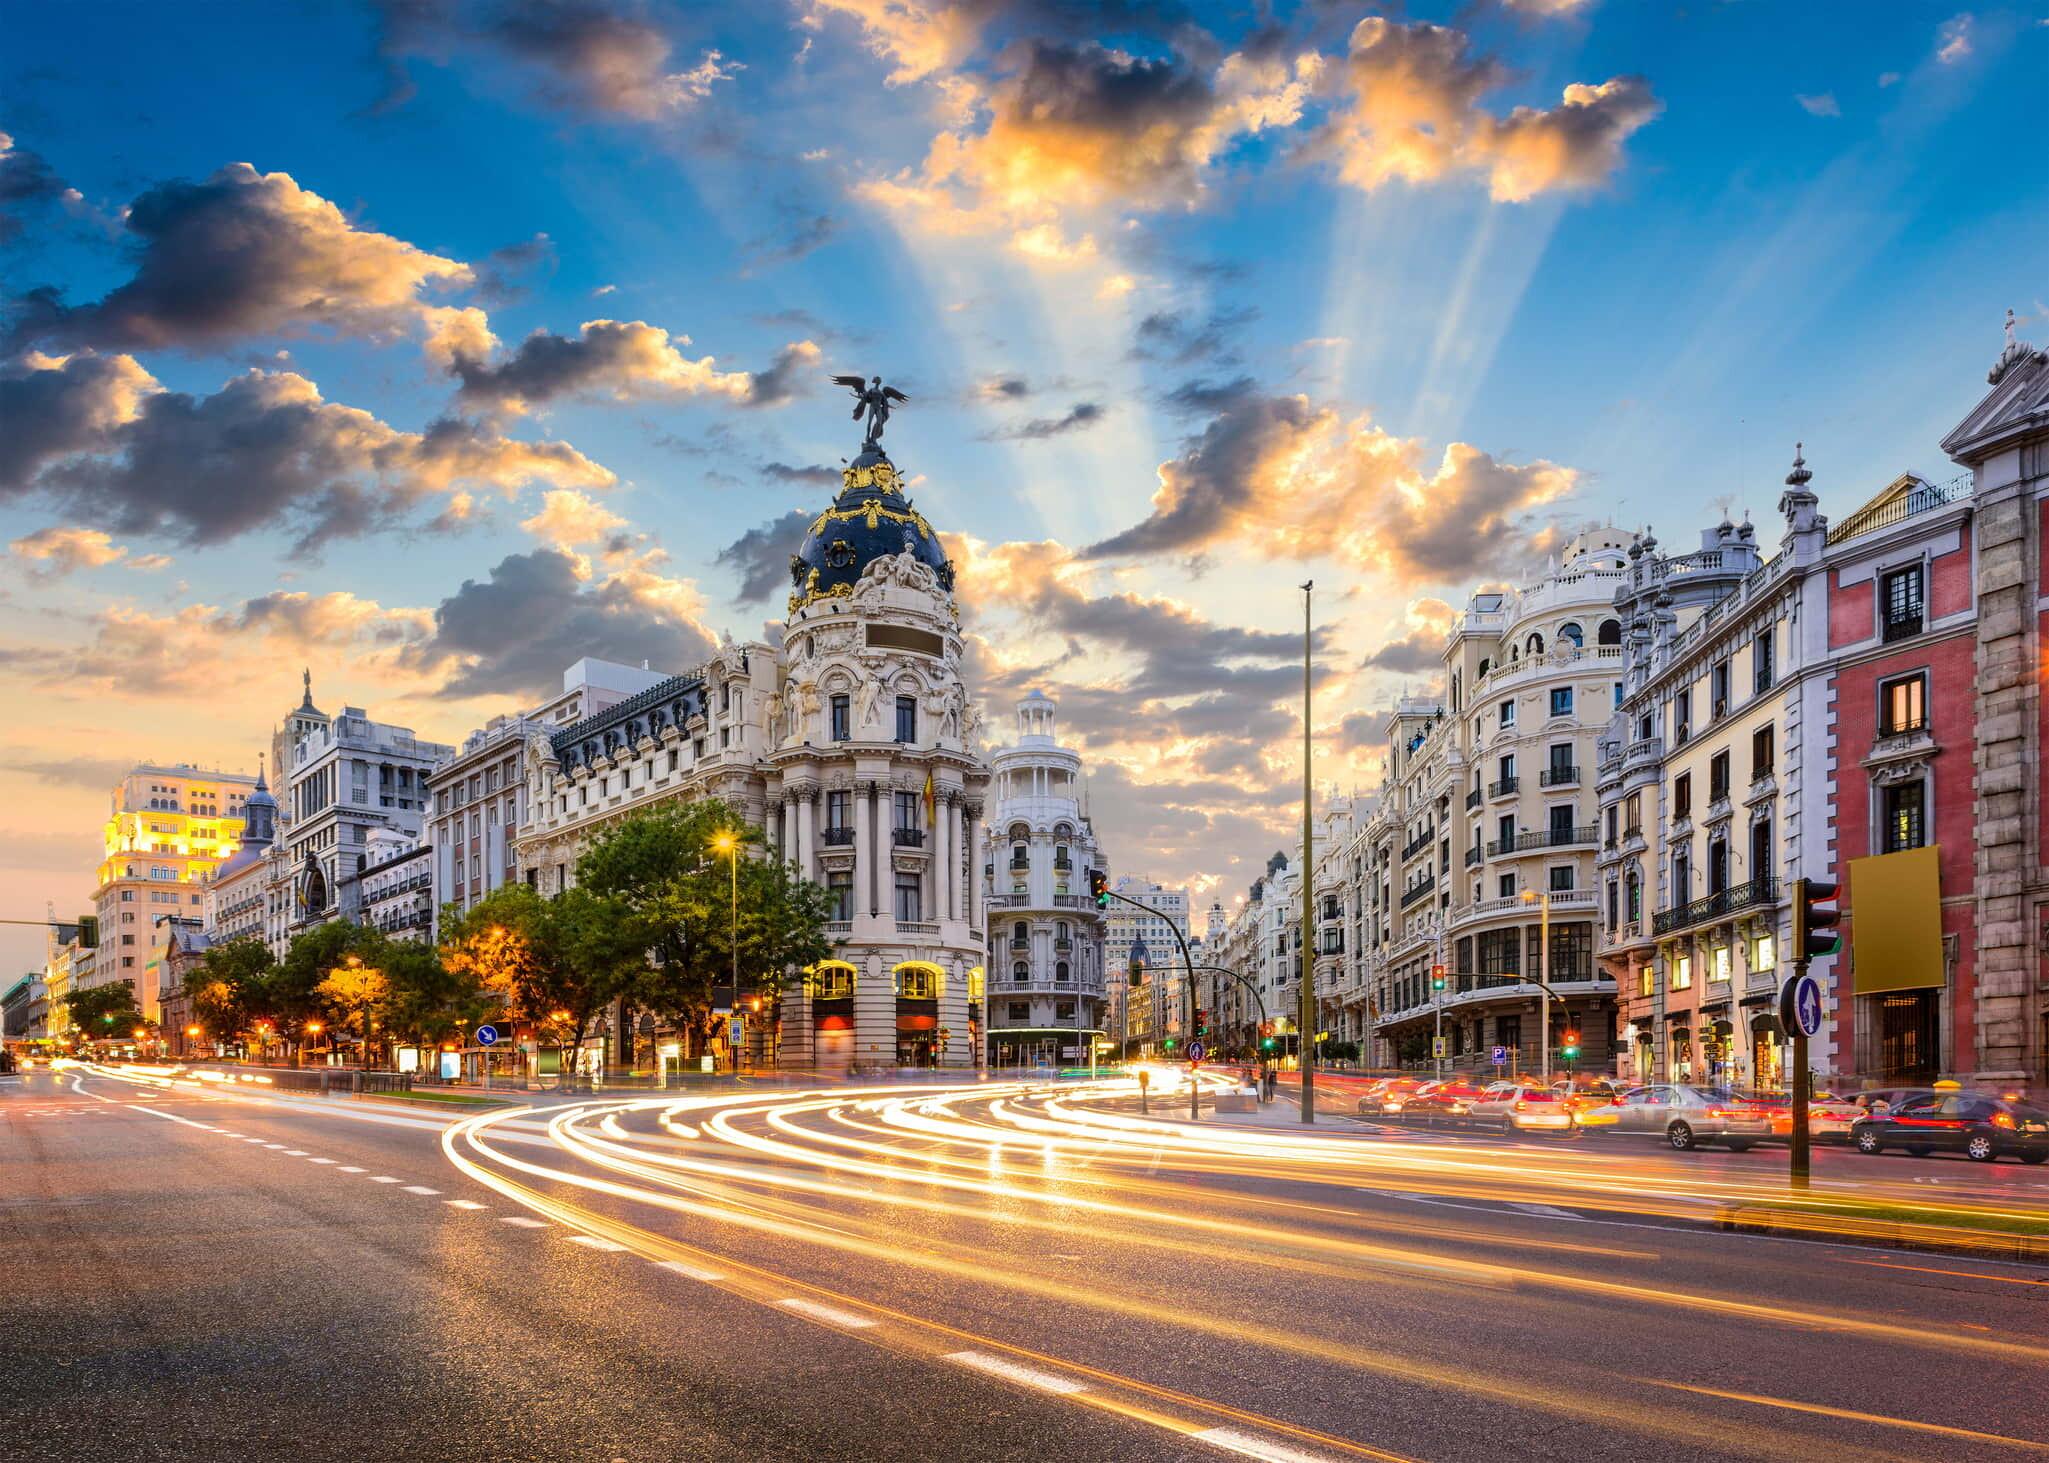 Madrid busca atraer turismo latinoamericano mediante seminarios web –  Inmobiliare